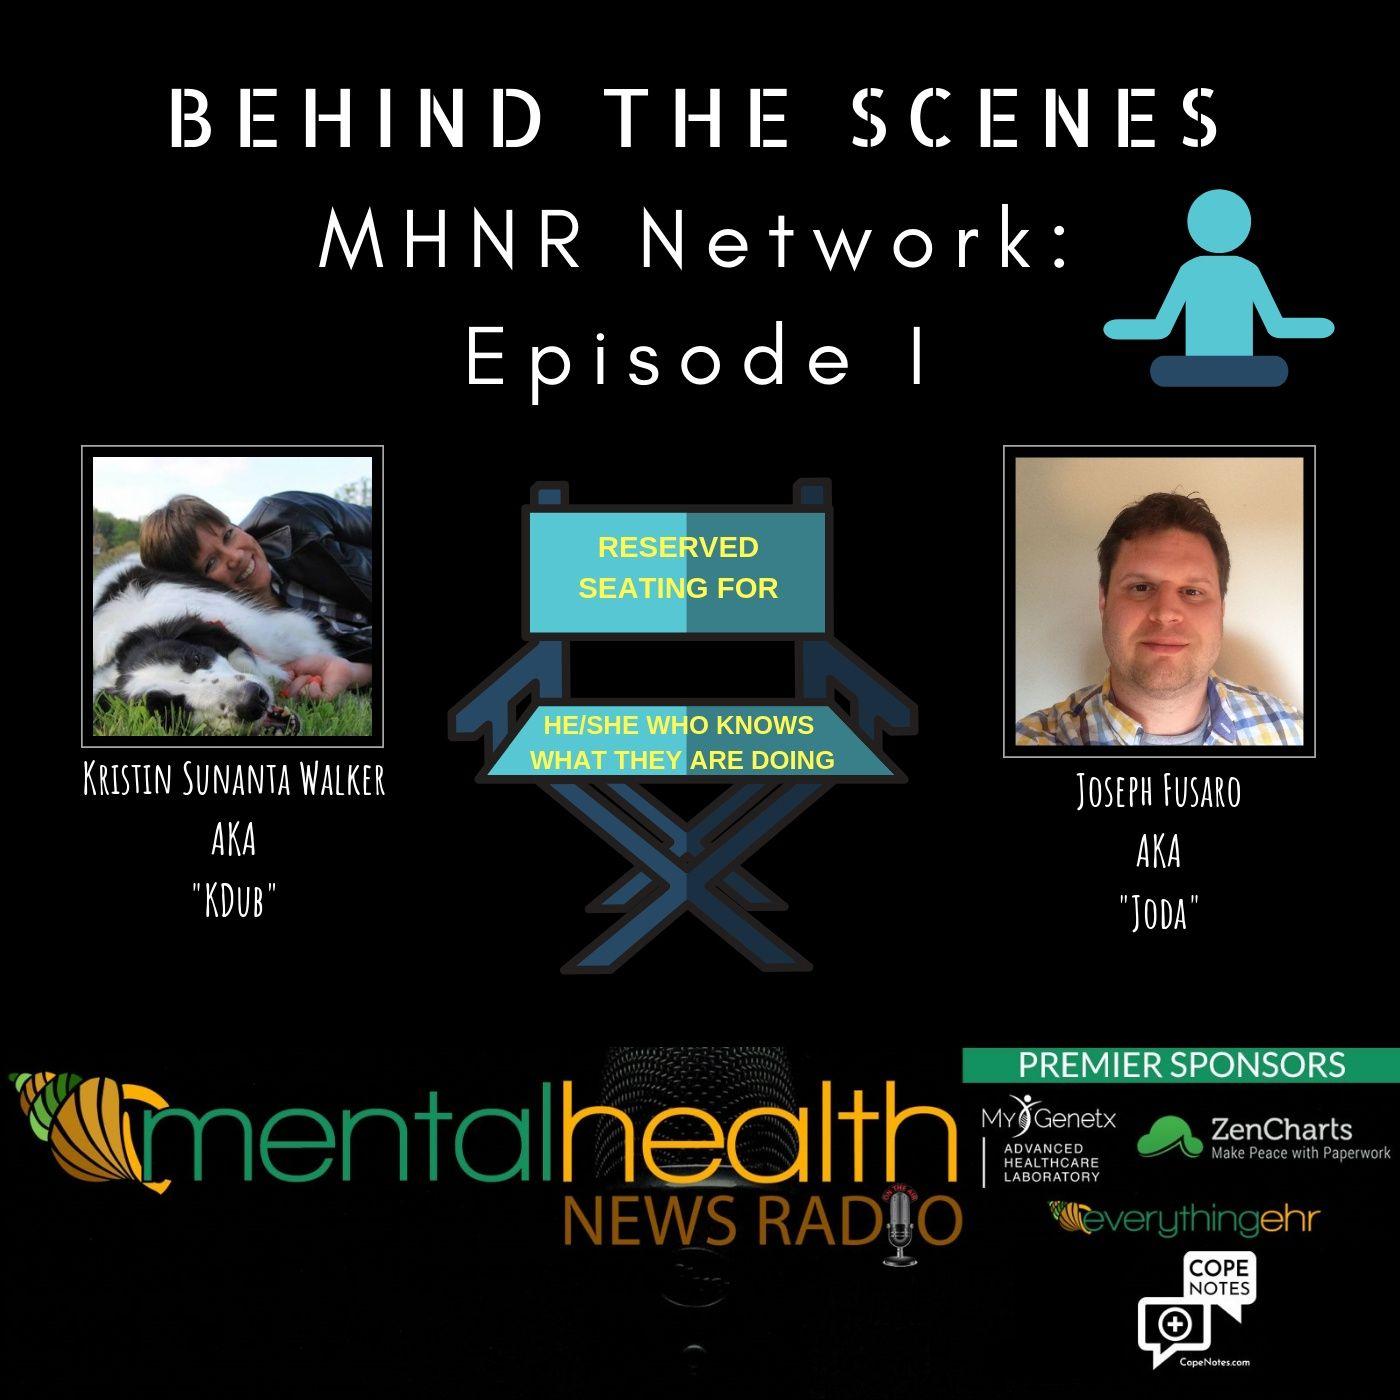 Mental Health News Radio - Behind the Scenes of MHNR: Episode I